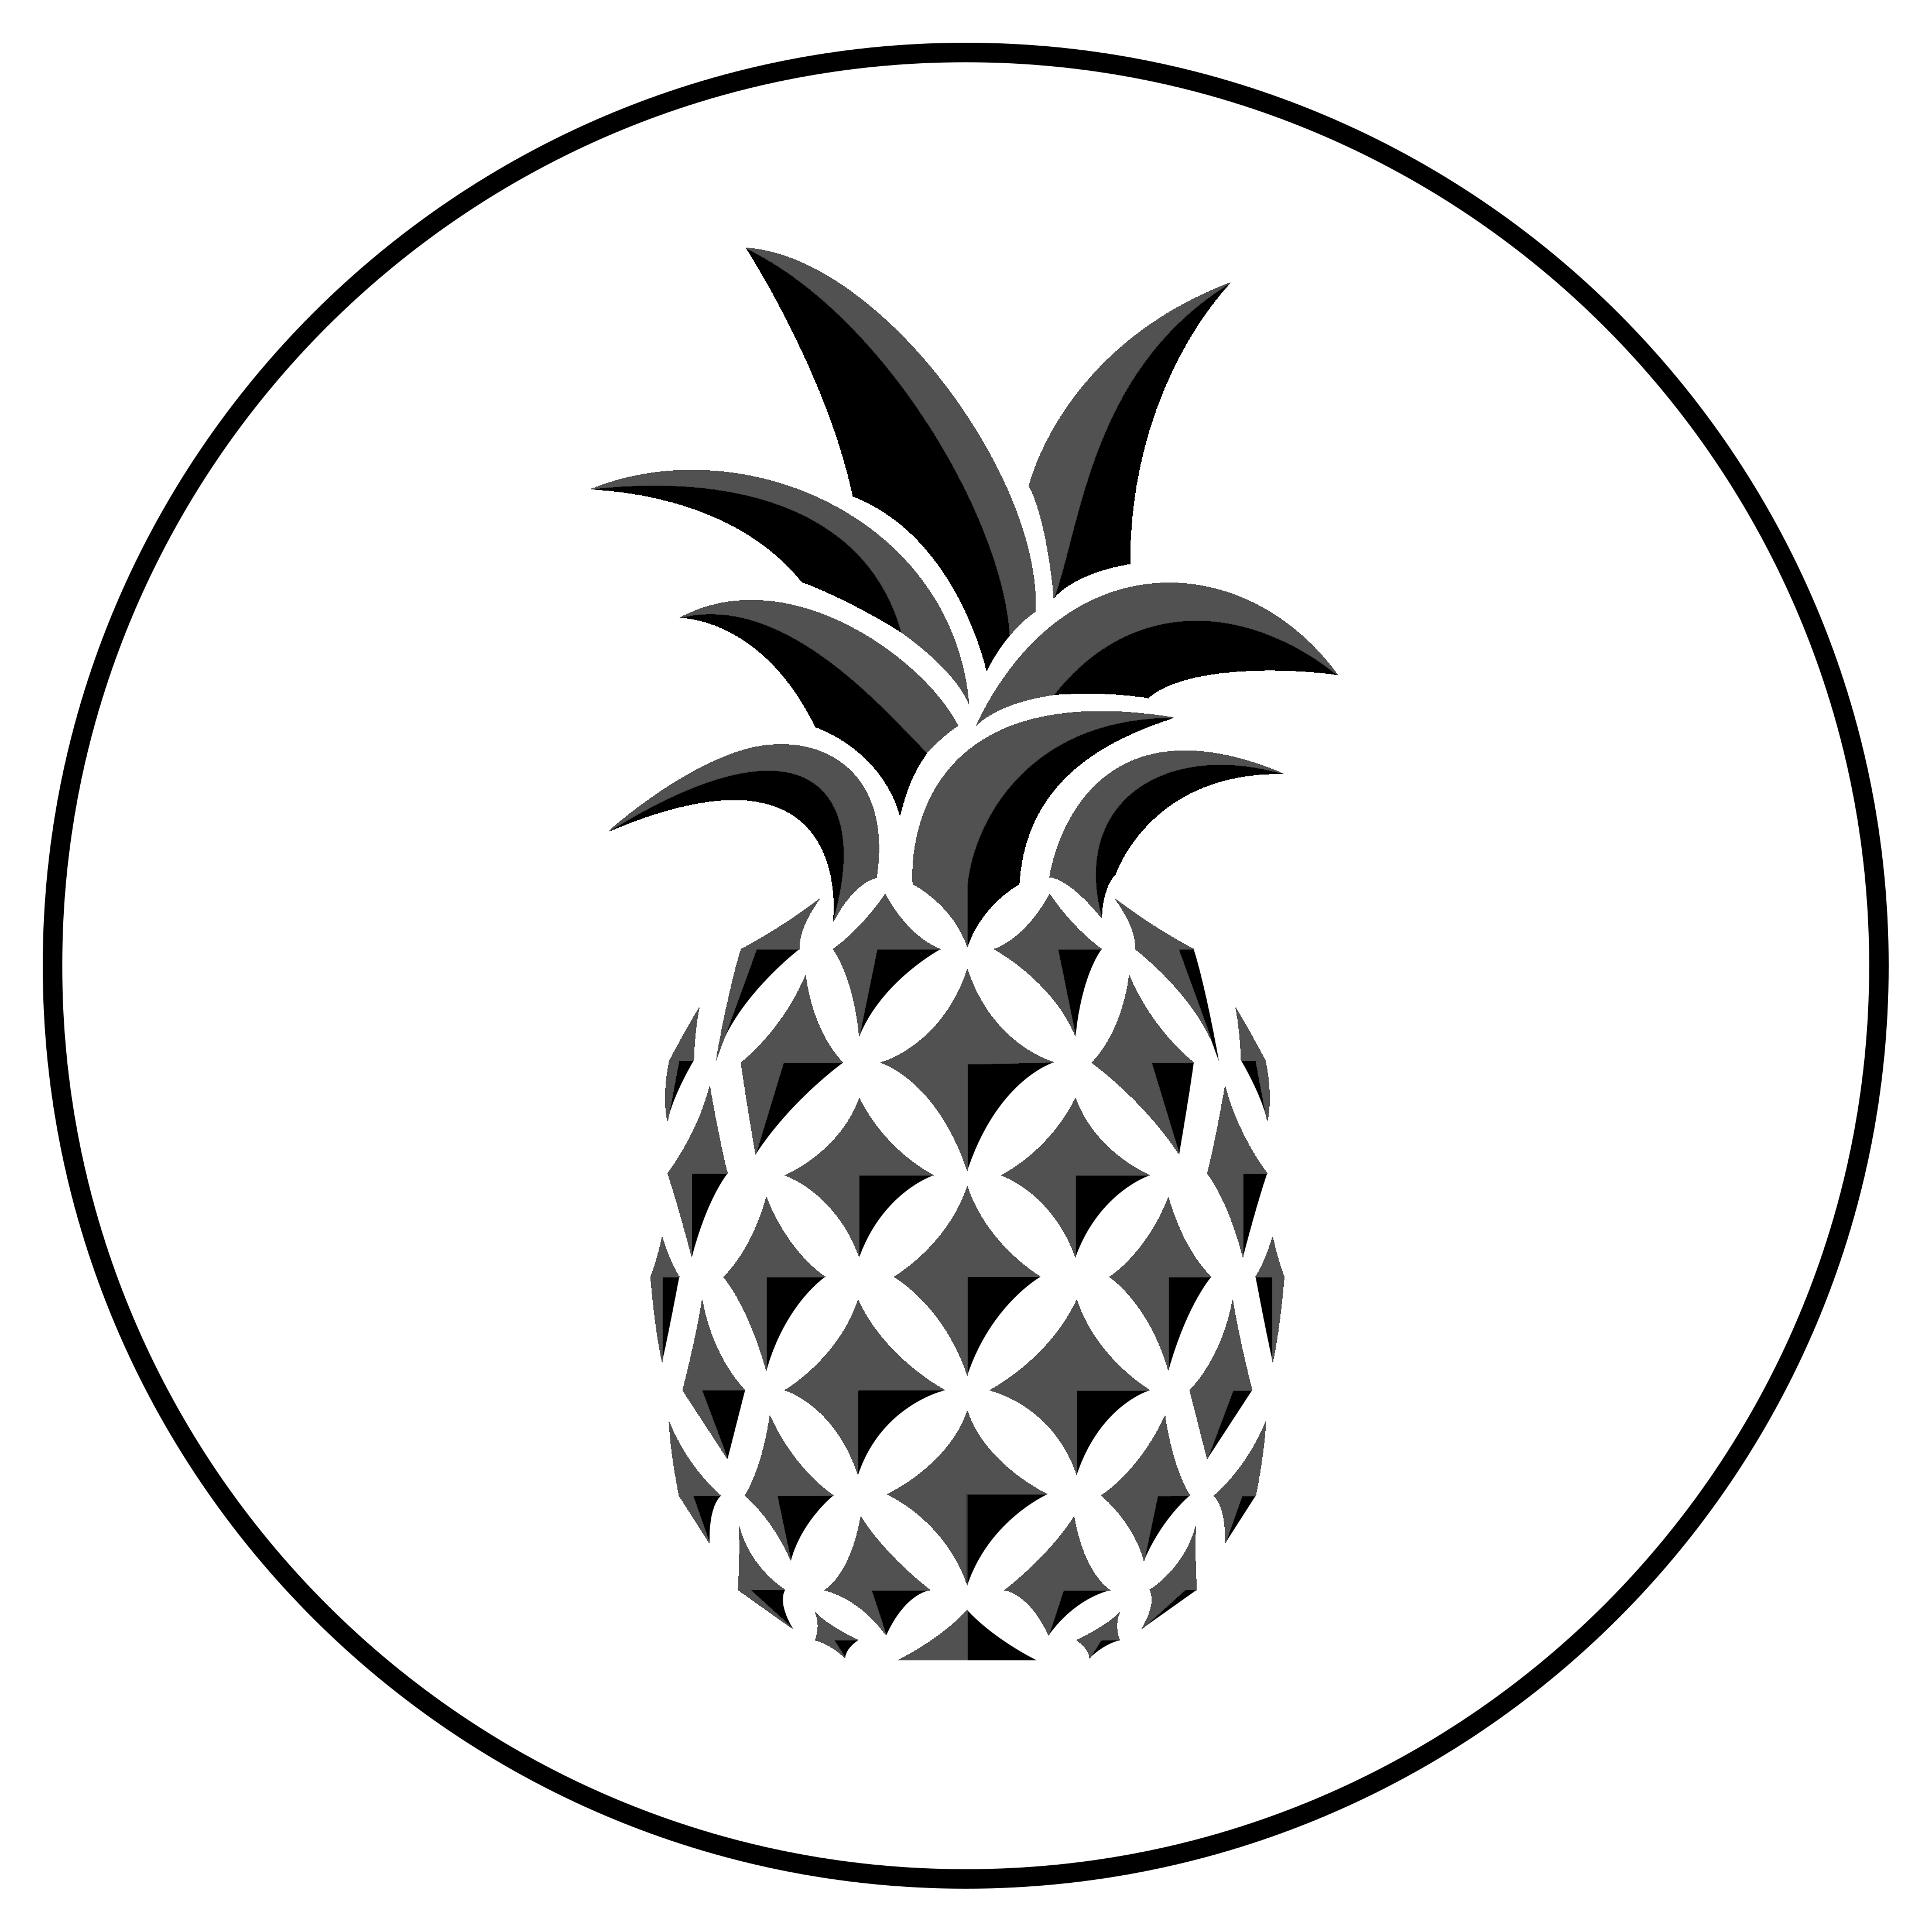 Dancing Pineapple Bot for Facebook Messenger